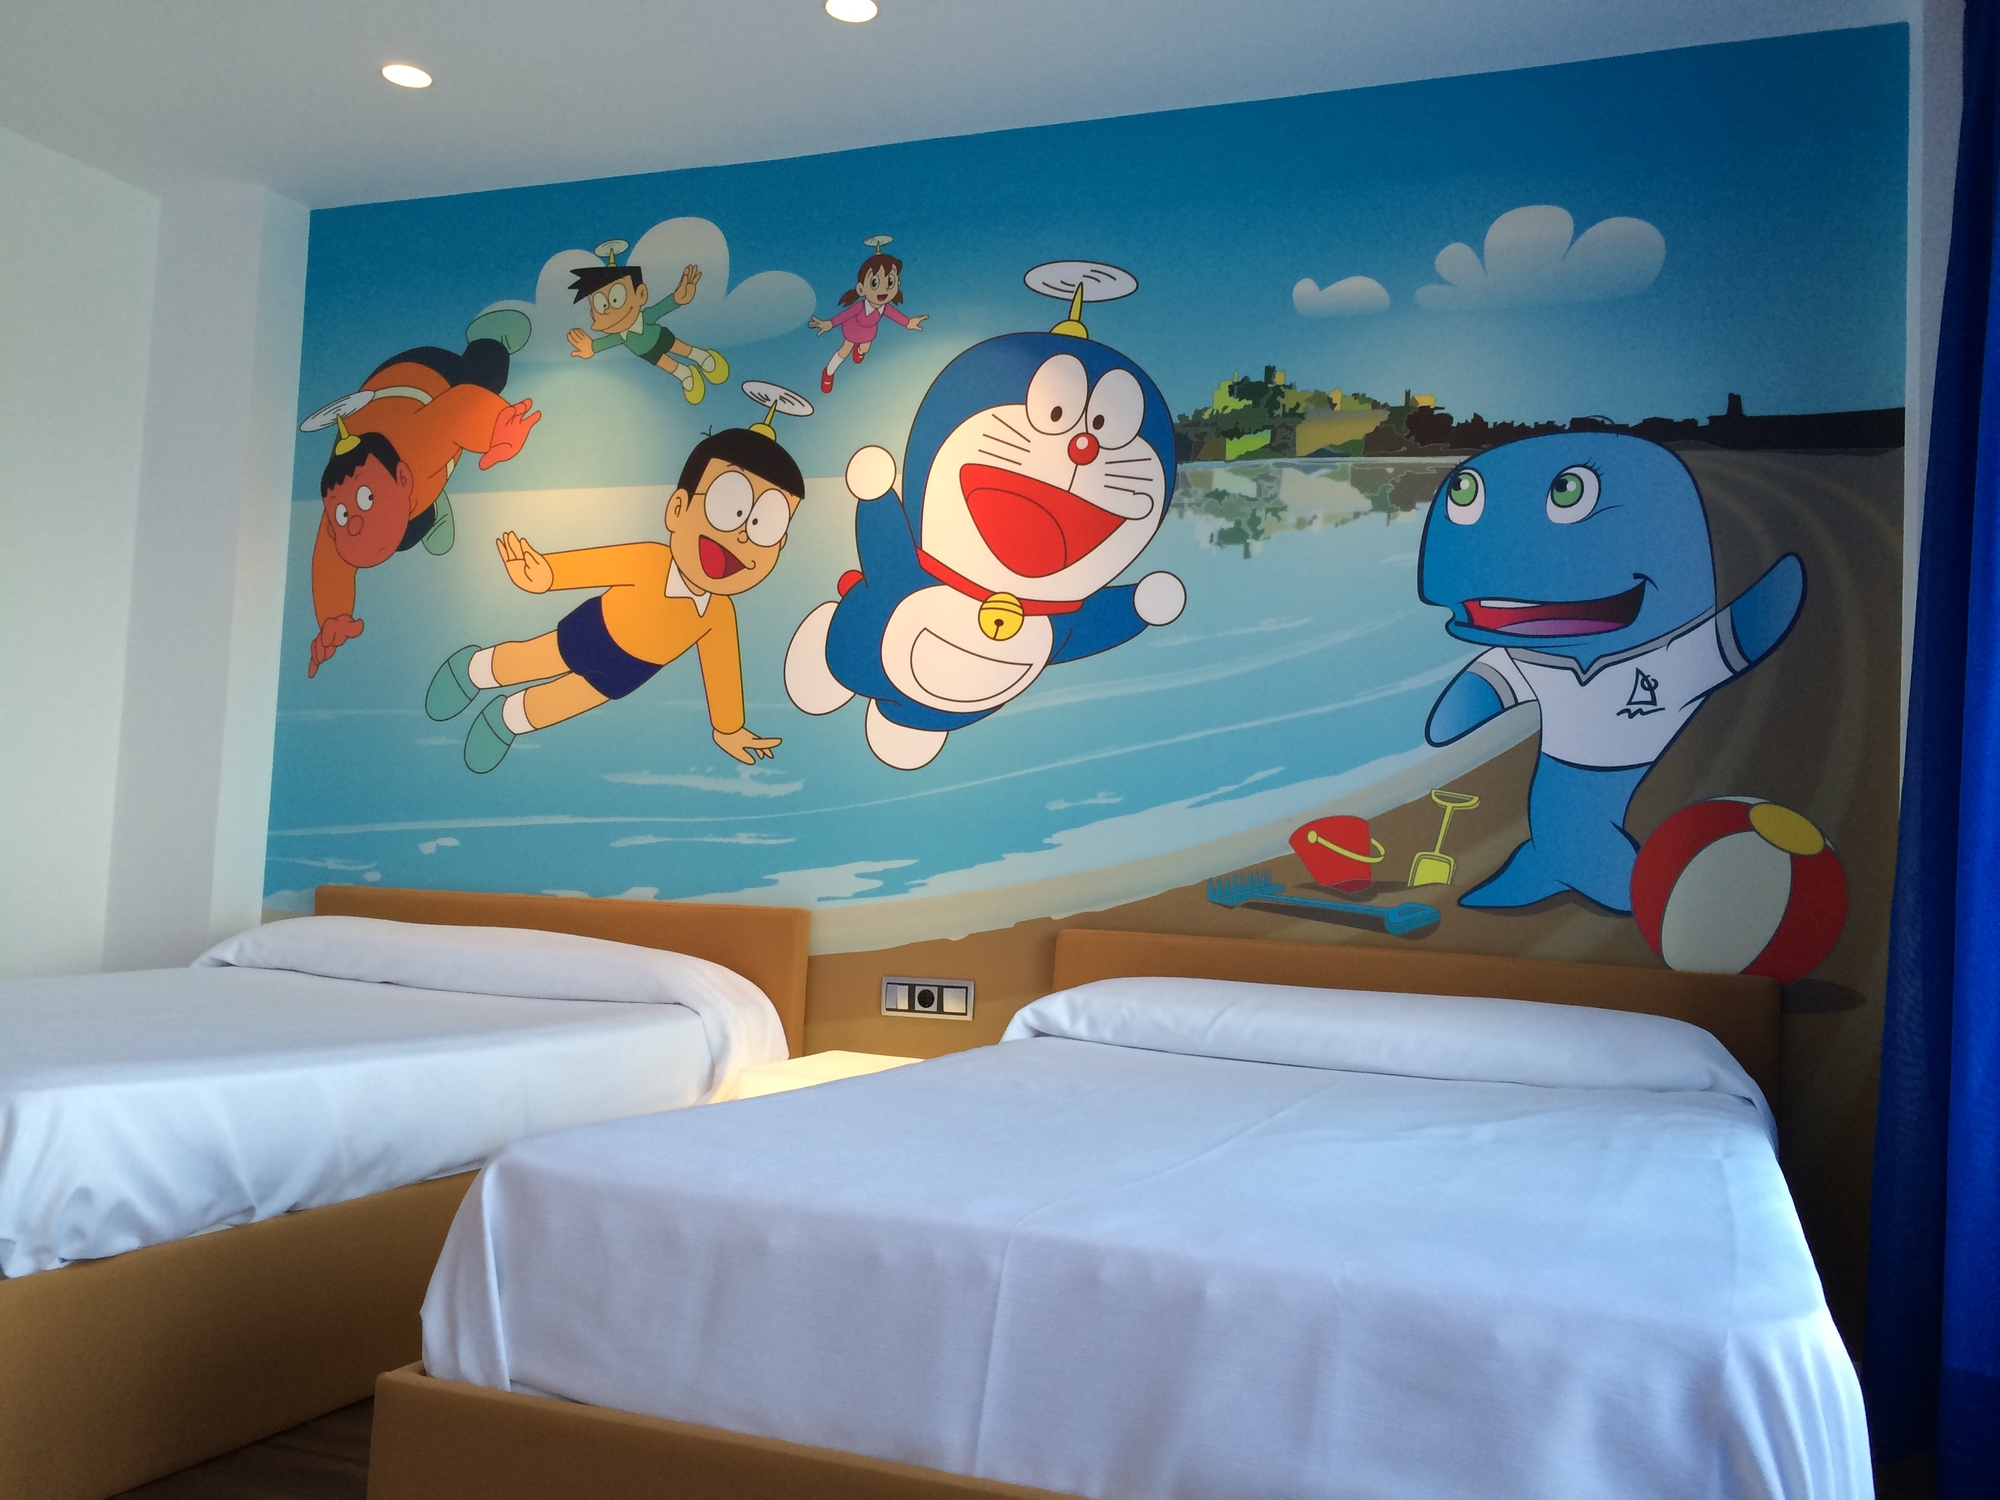 Habitaciones tem ticas infantiles del hotel acuazul hoteles mediterraneo - Habitaciones tematicas infantiles ...